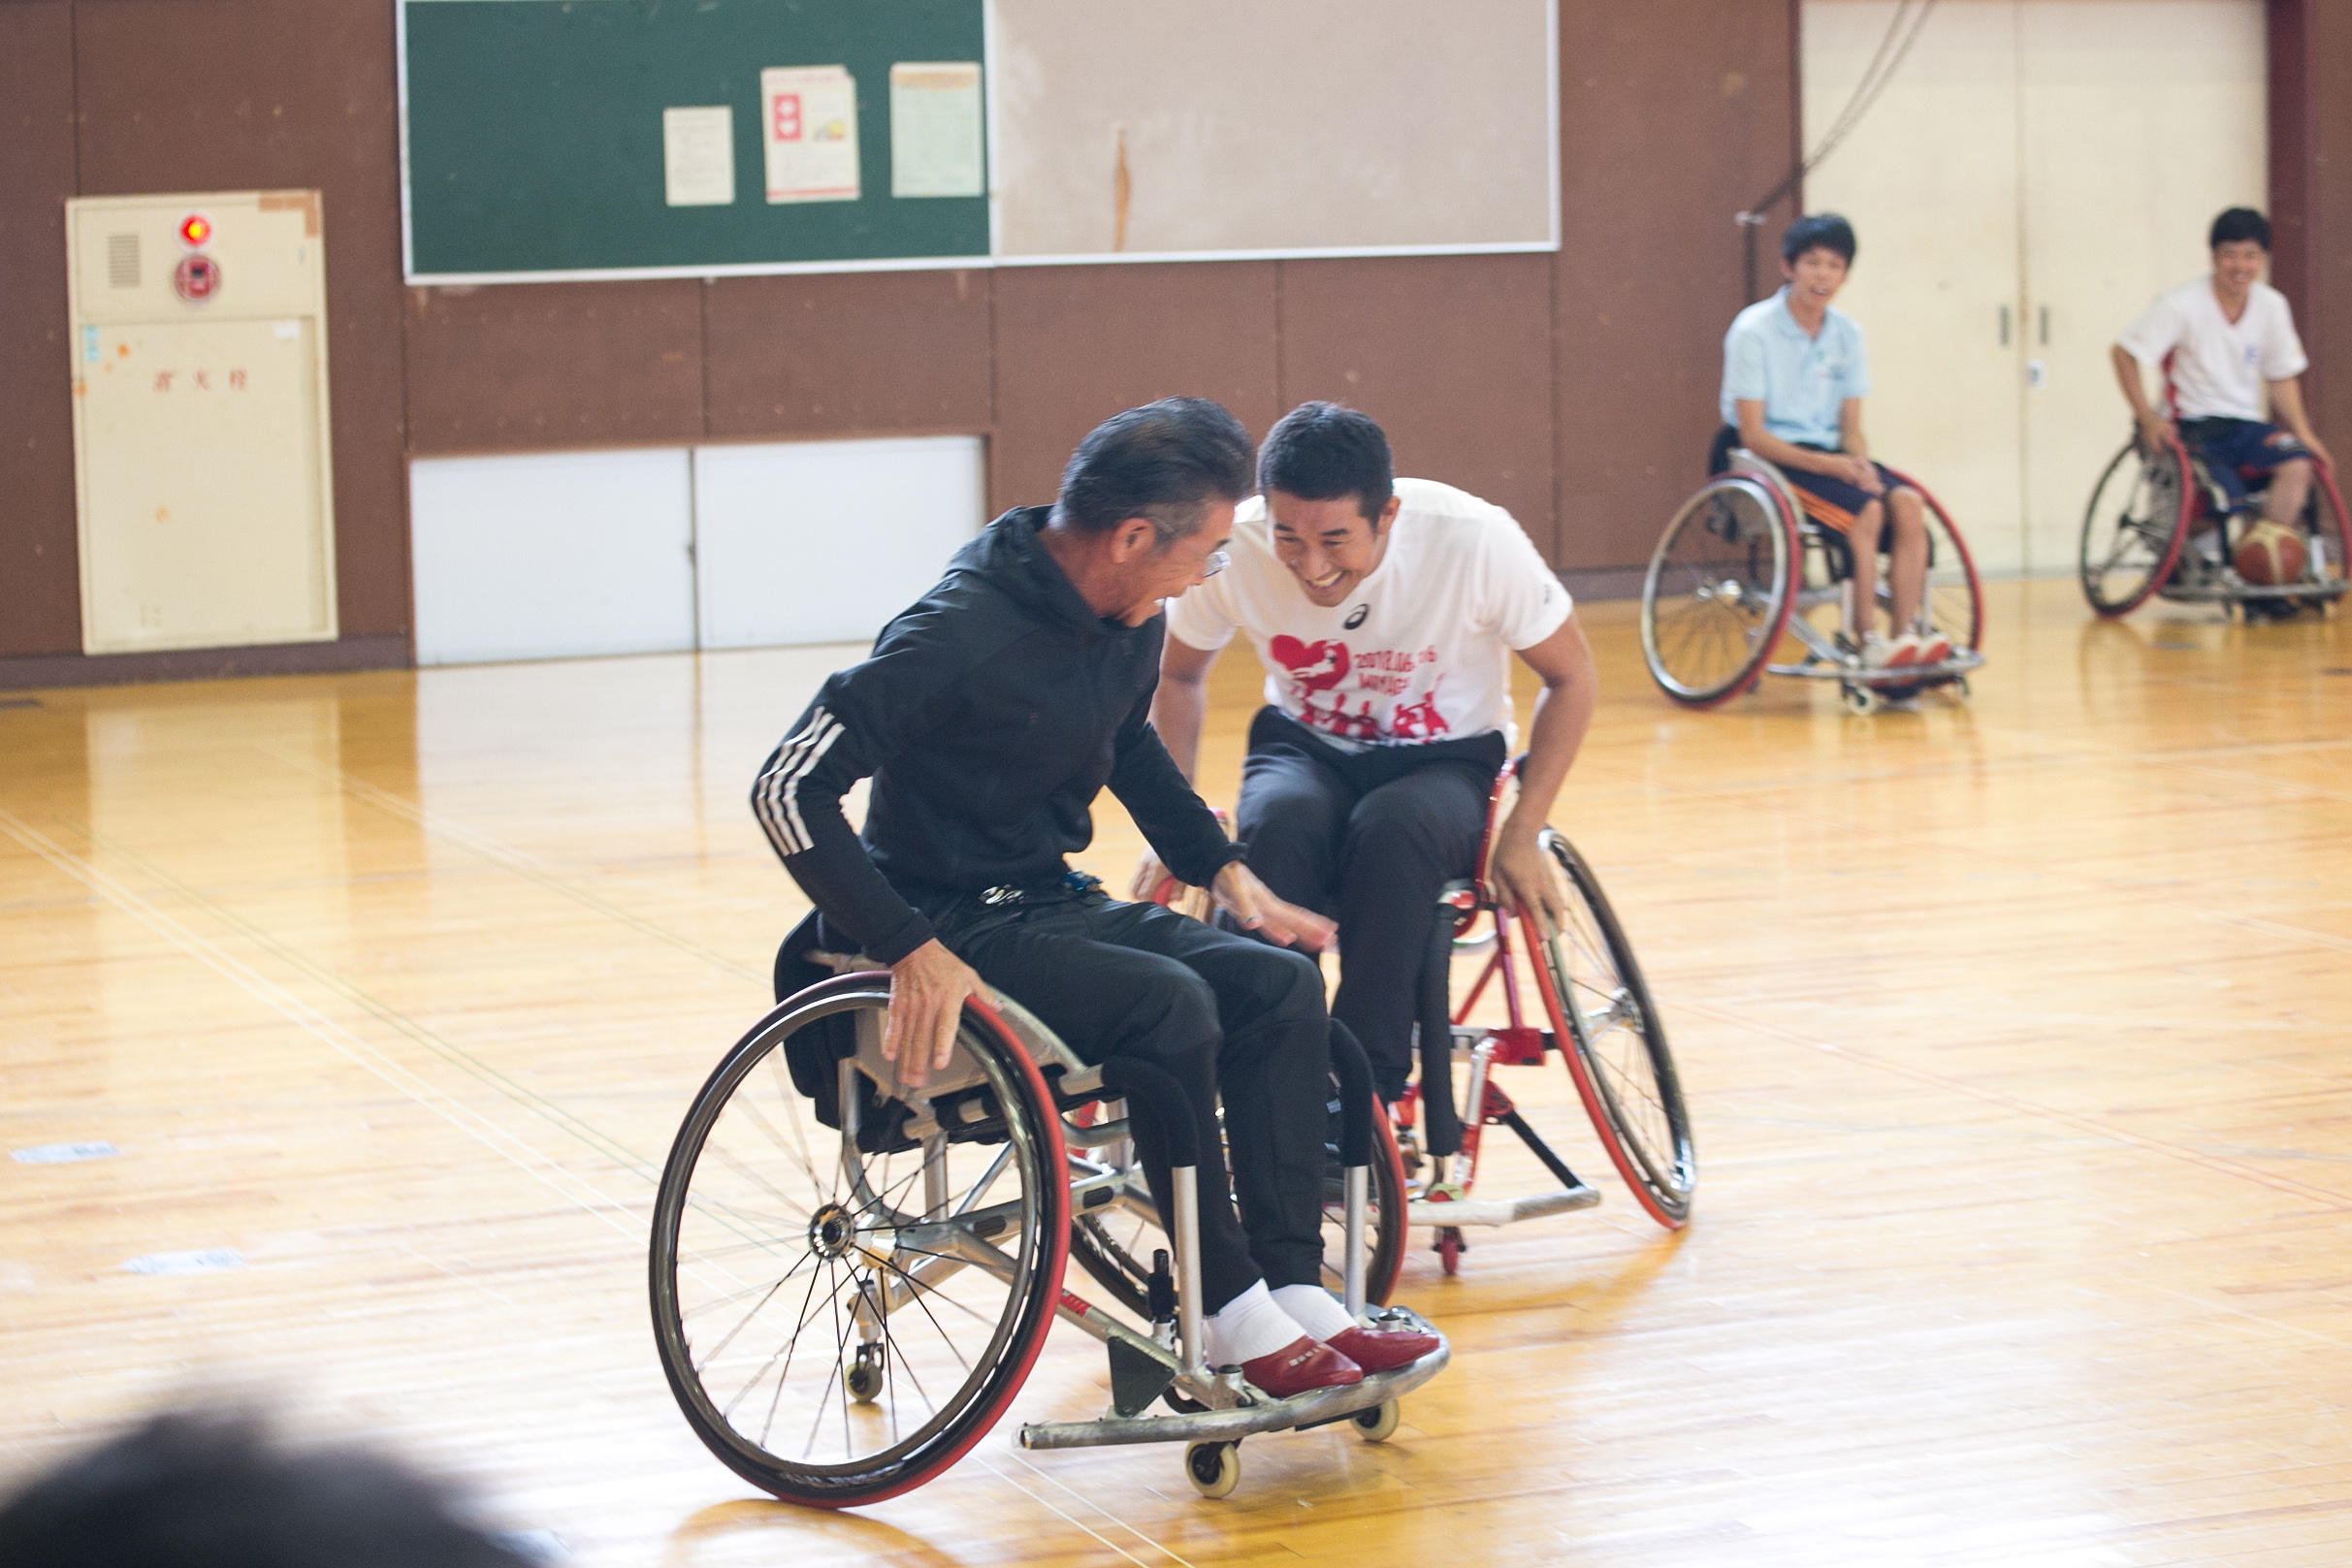 http://news.yoshimoto.co.jp/20181004222507-78a2c851fbd05dd00978a75059d2598b1a348980.jpg